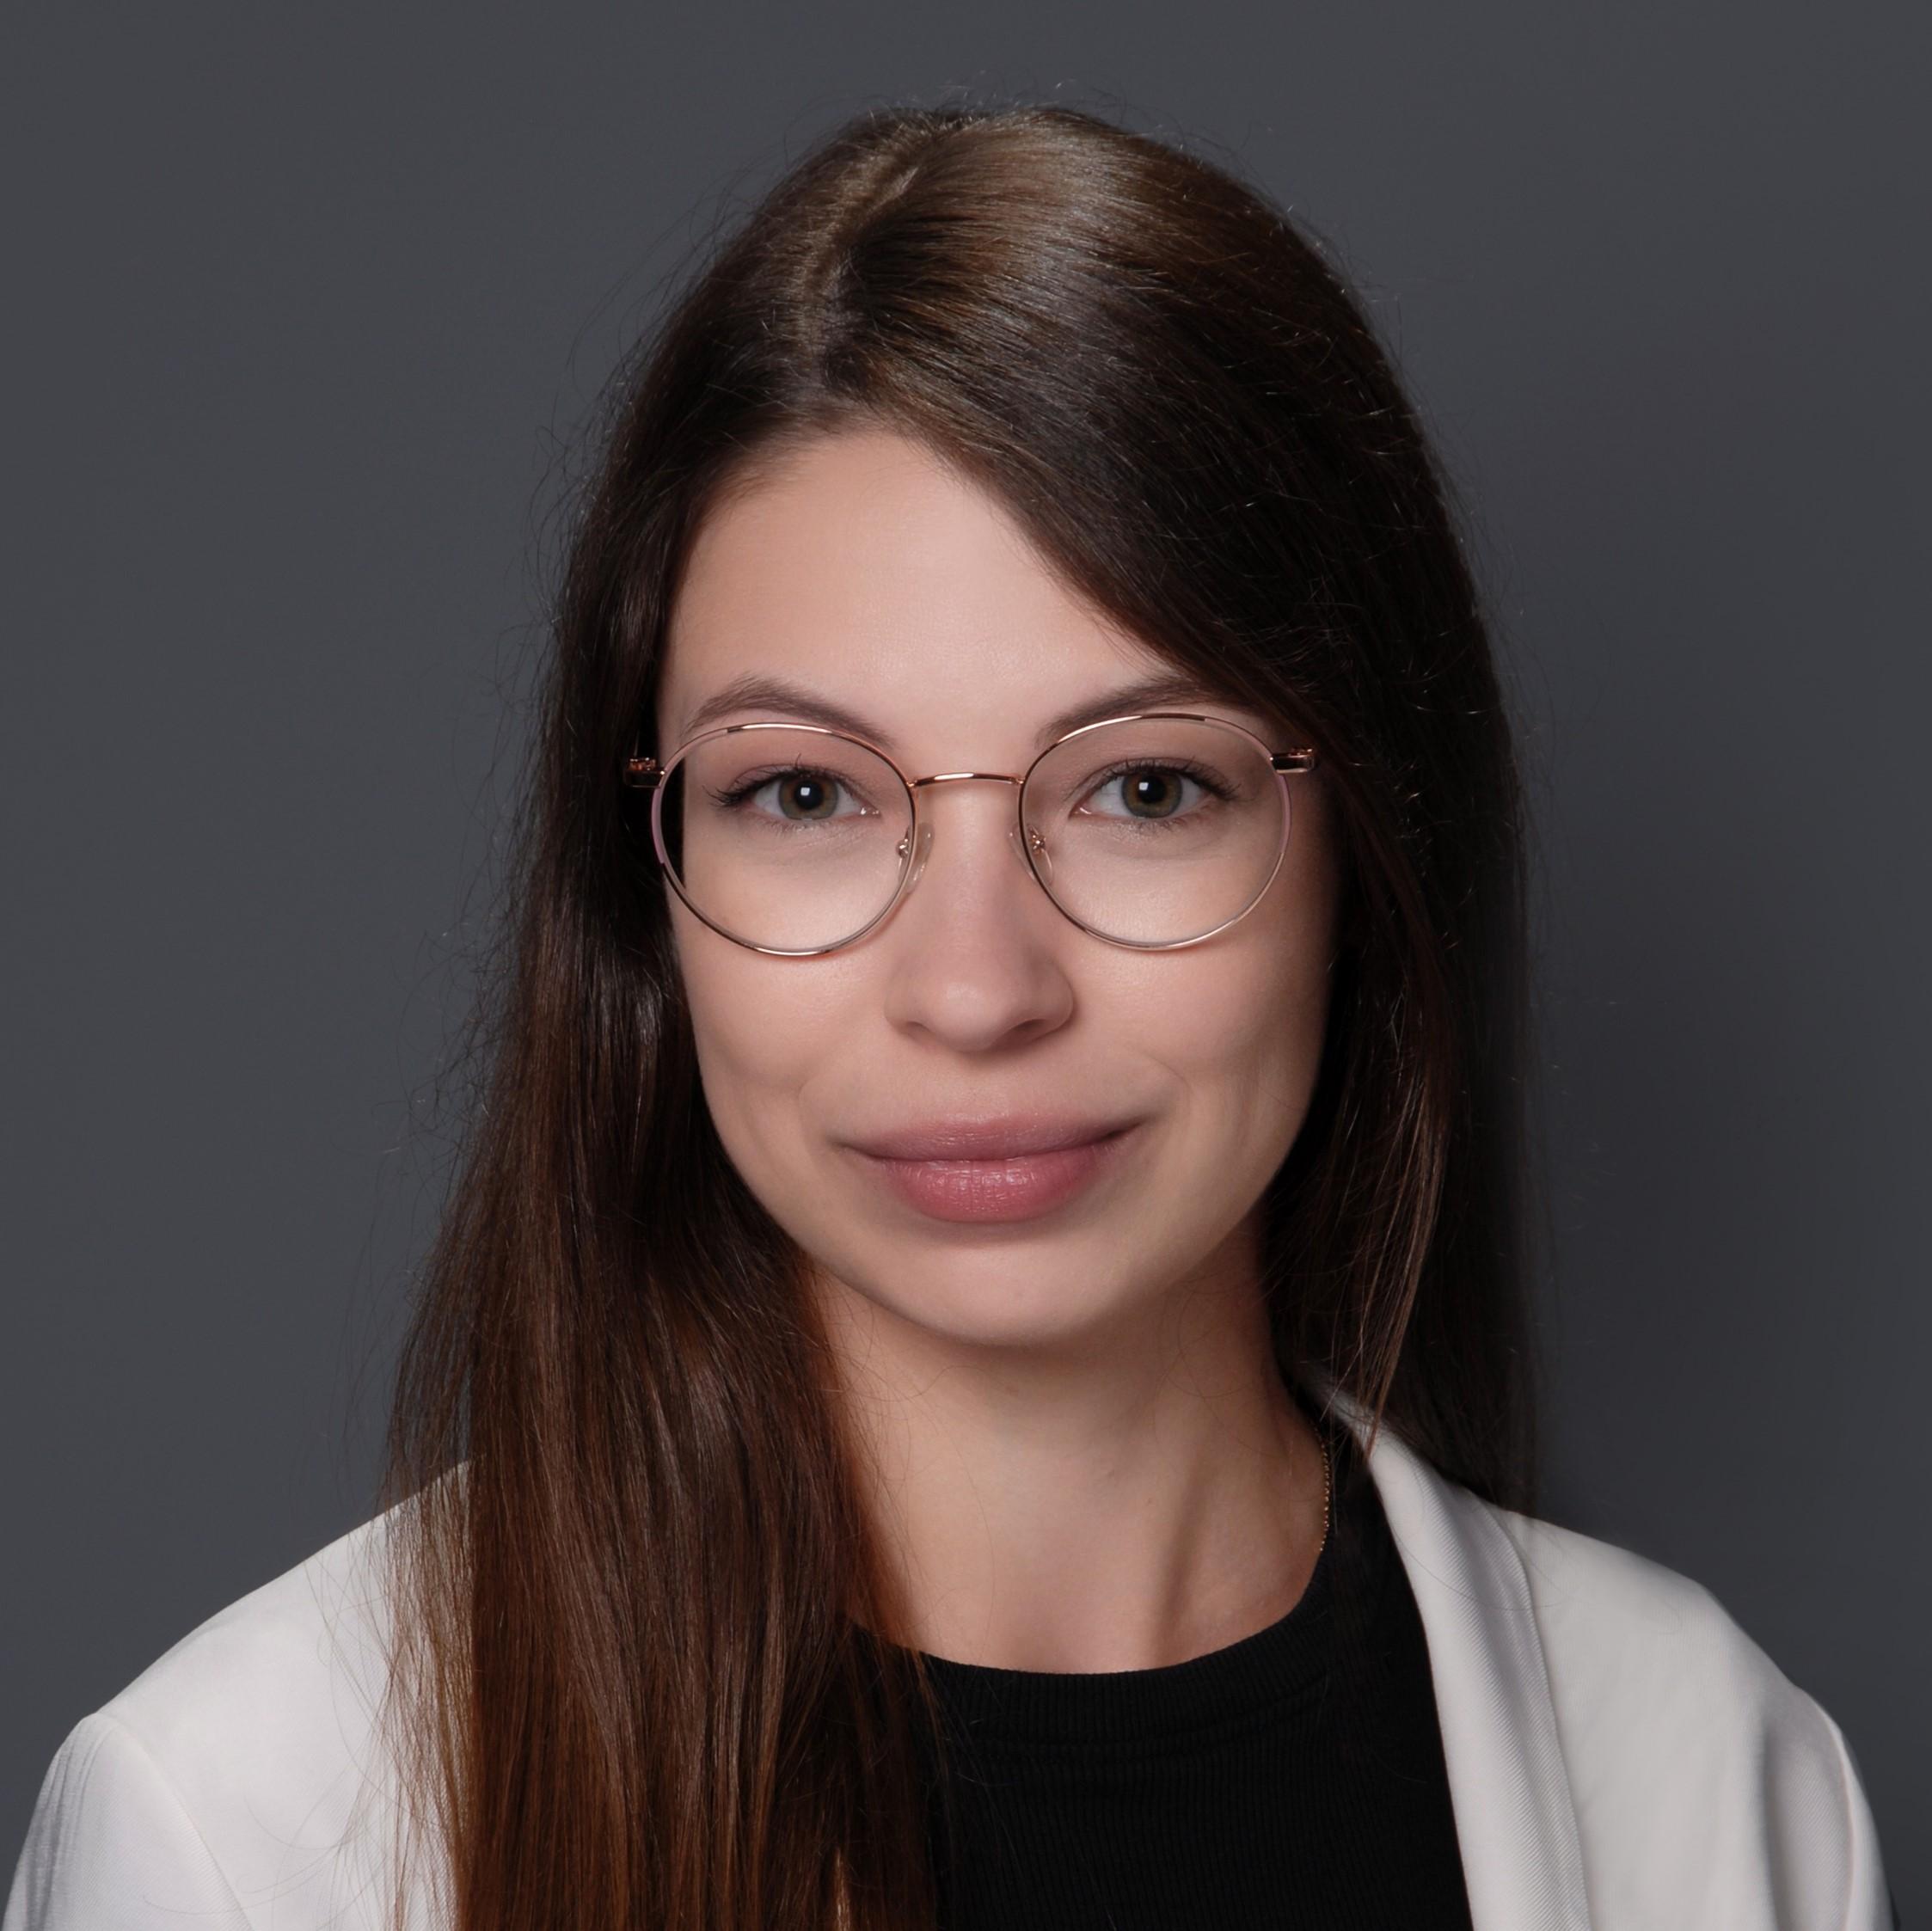 Marta Jaworska